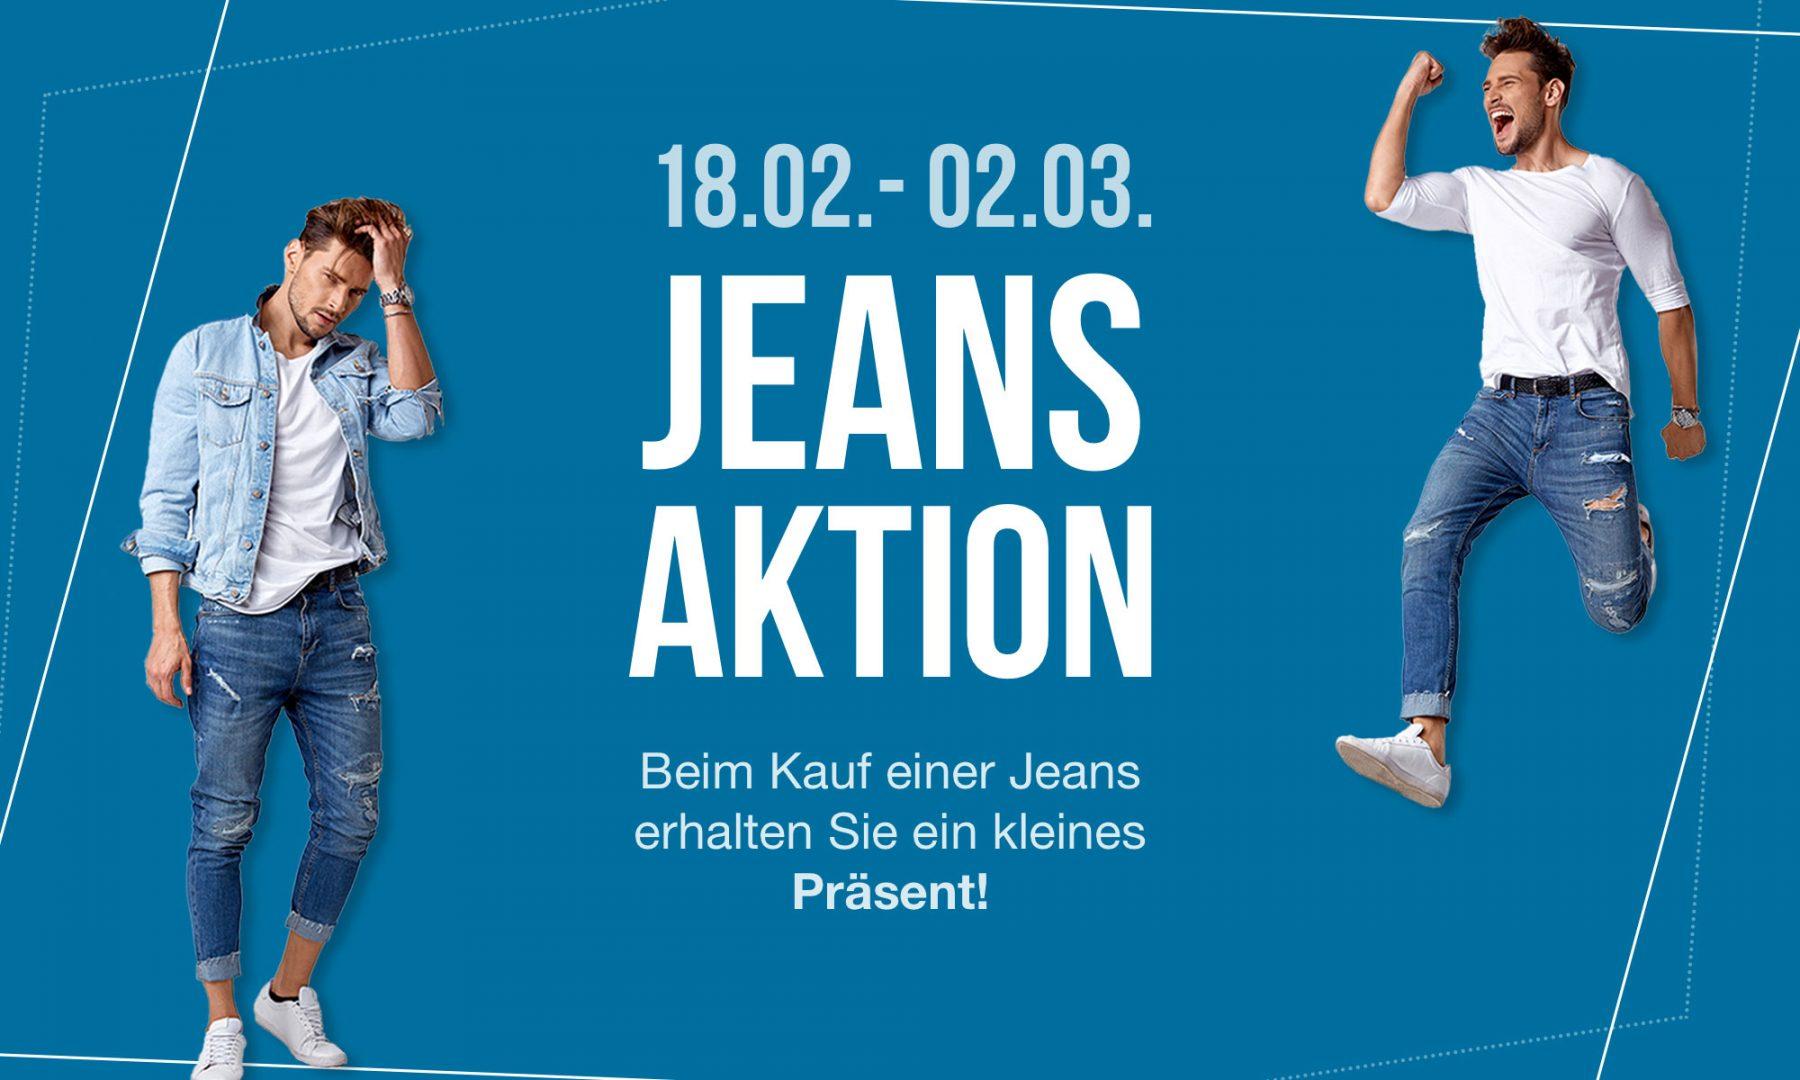 Jeans Aktion vom 18.02. - 02.03.2019